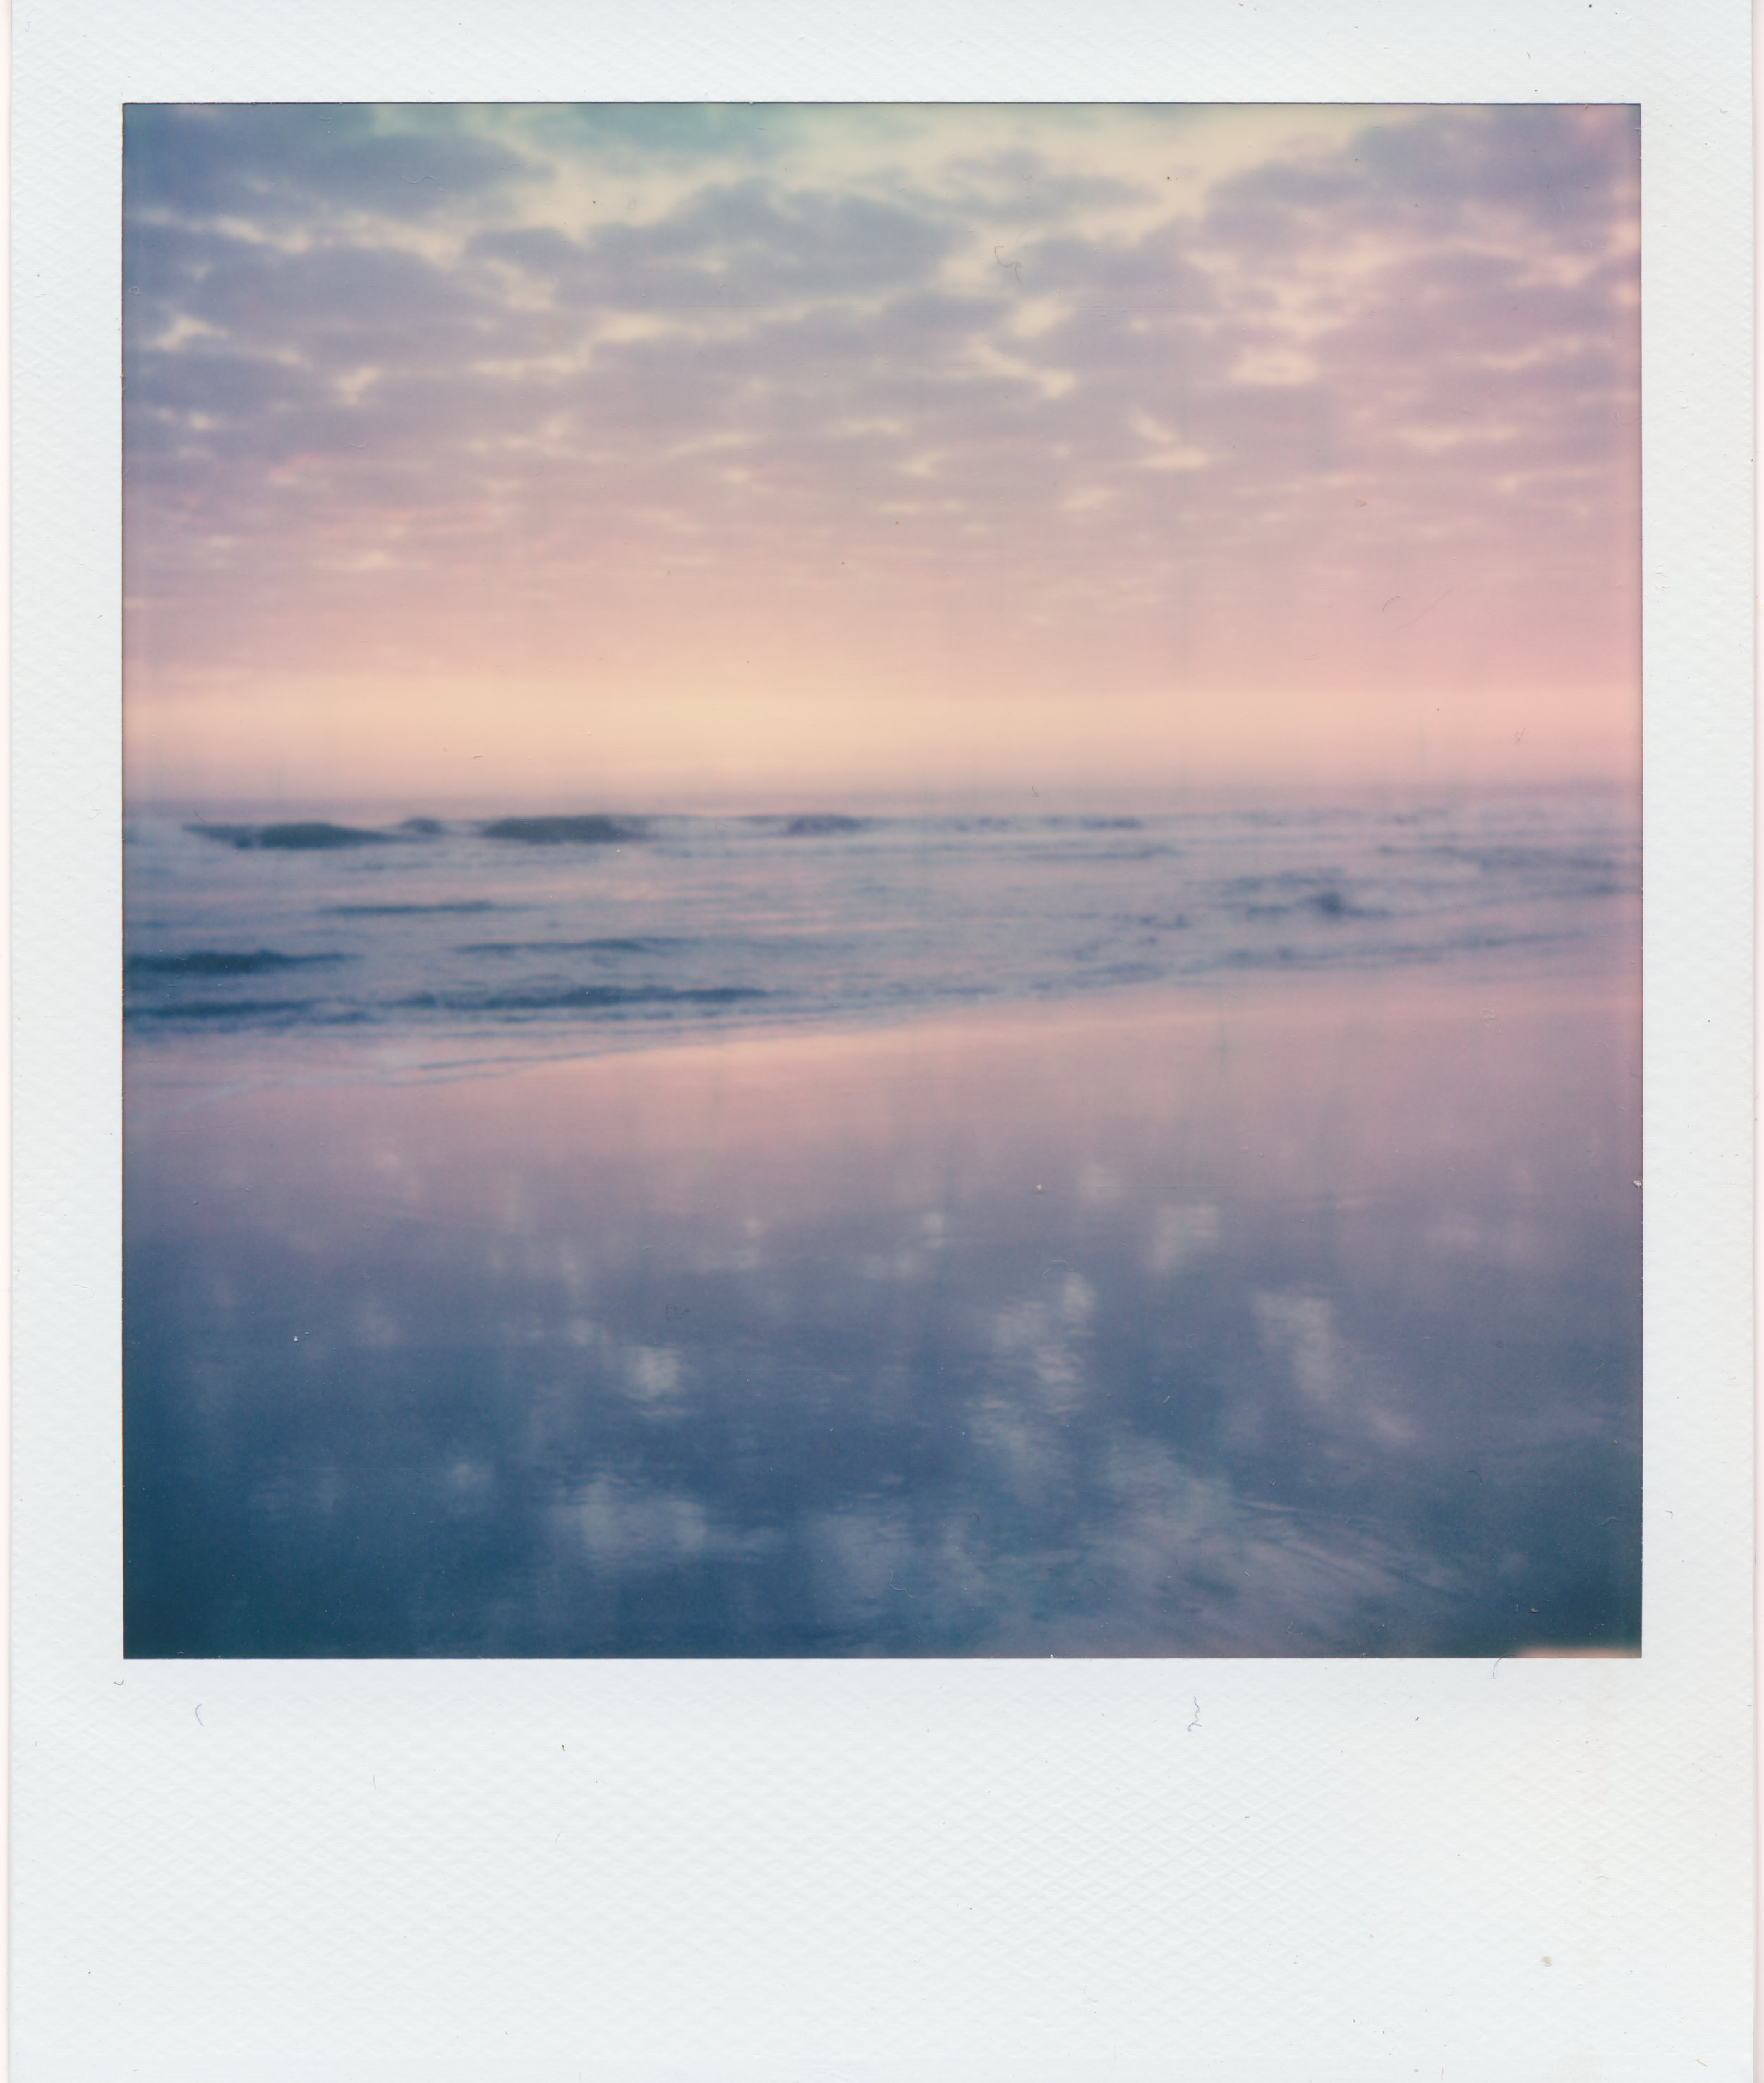 Pastel Morning | Polaroid Originals | Tony Klimas